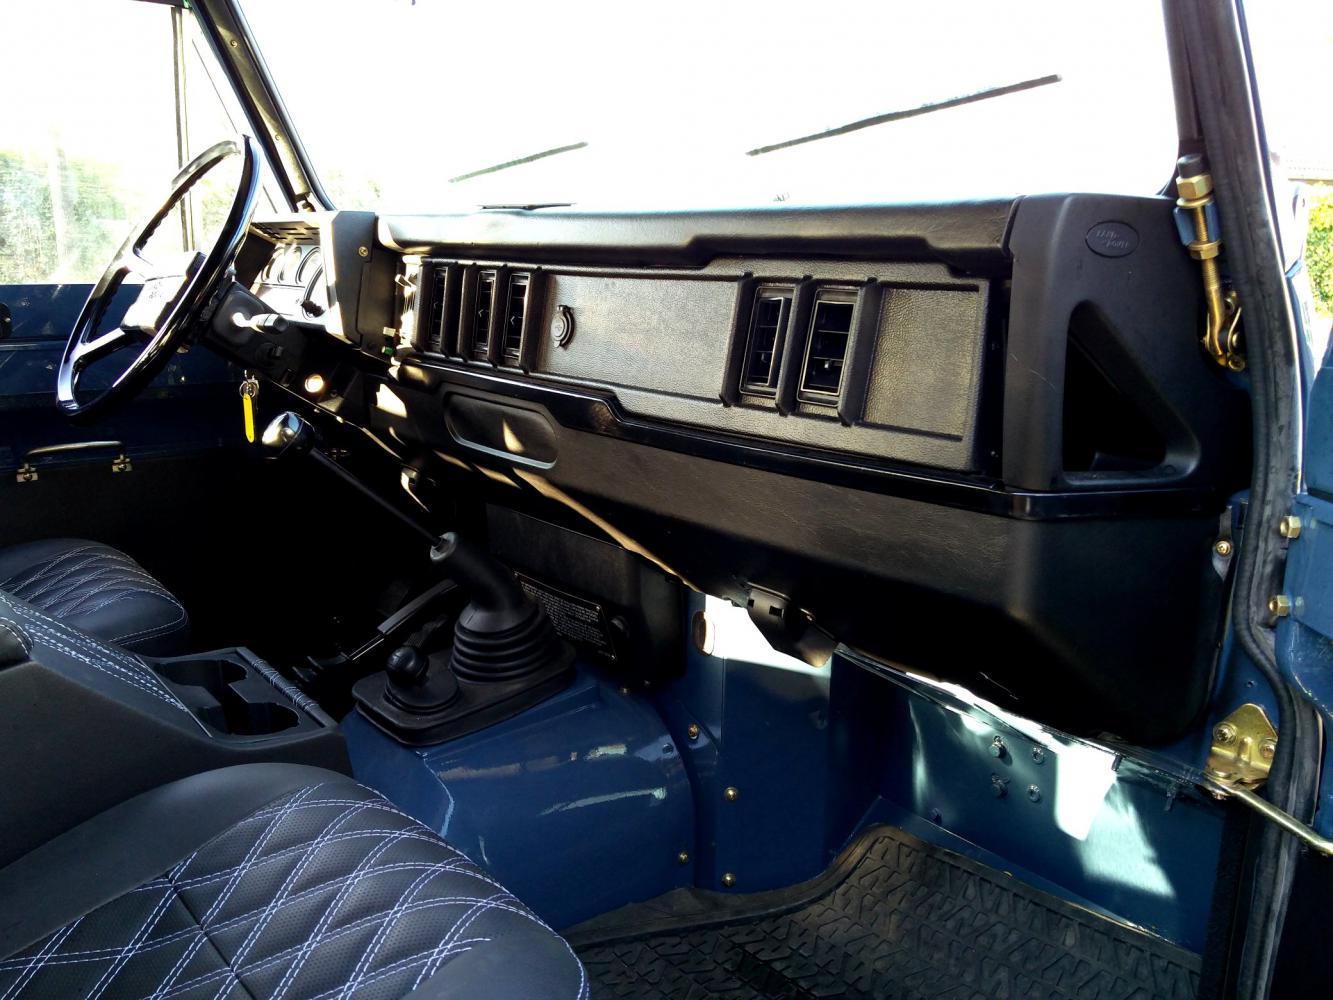 Click image for larger version  Name:1988 LR LHD Defender 110 Arles Blue day 40 dash and trim.jpg Views:34 Size:162.1 KB ID:359441